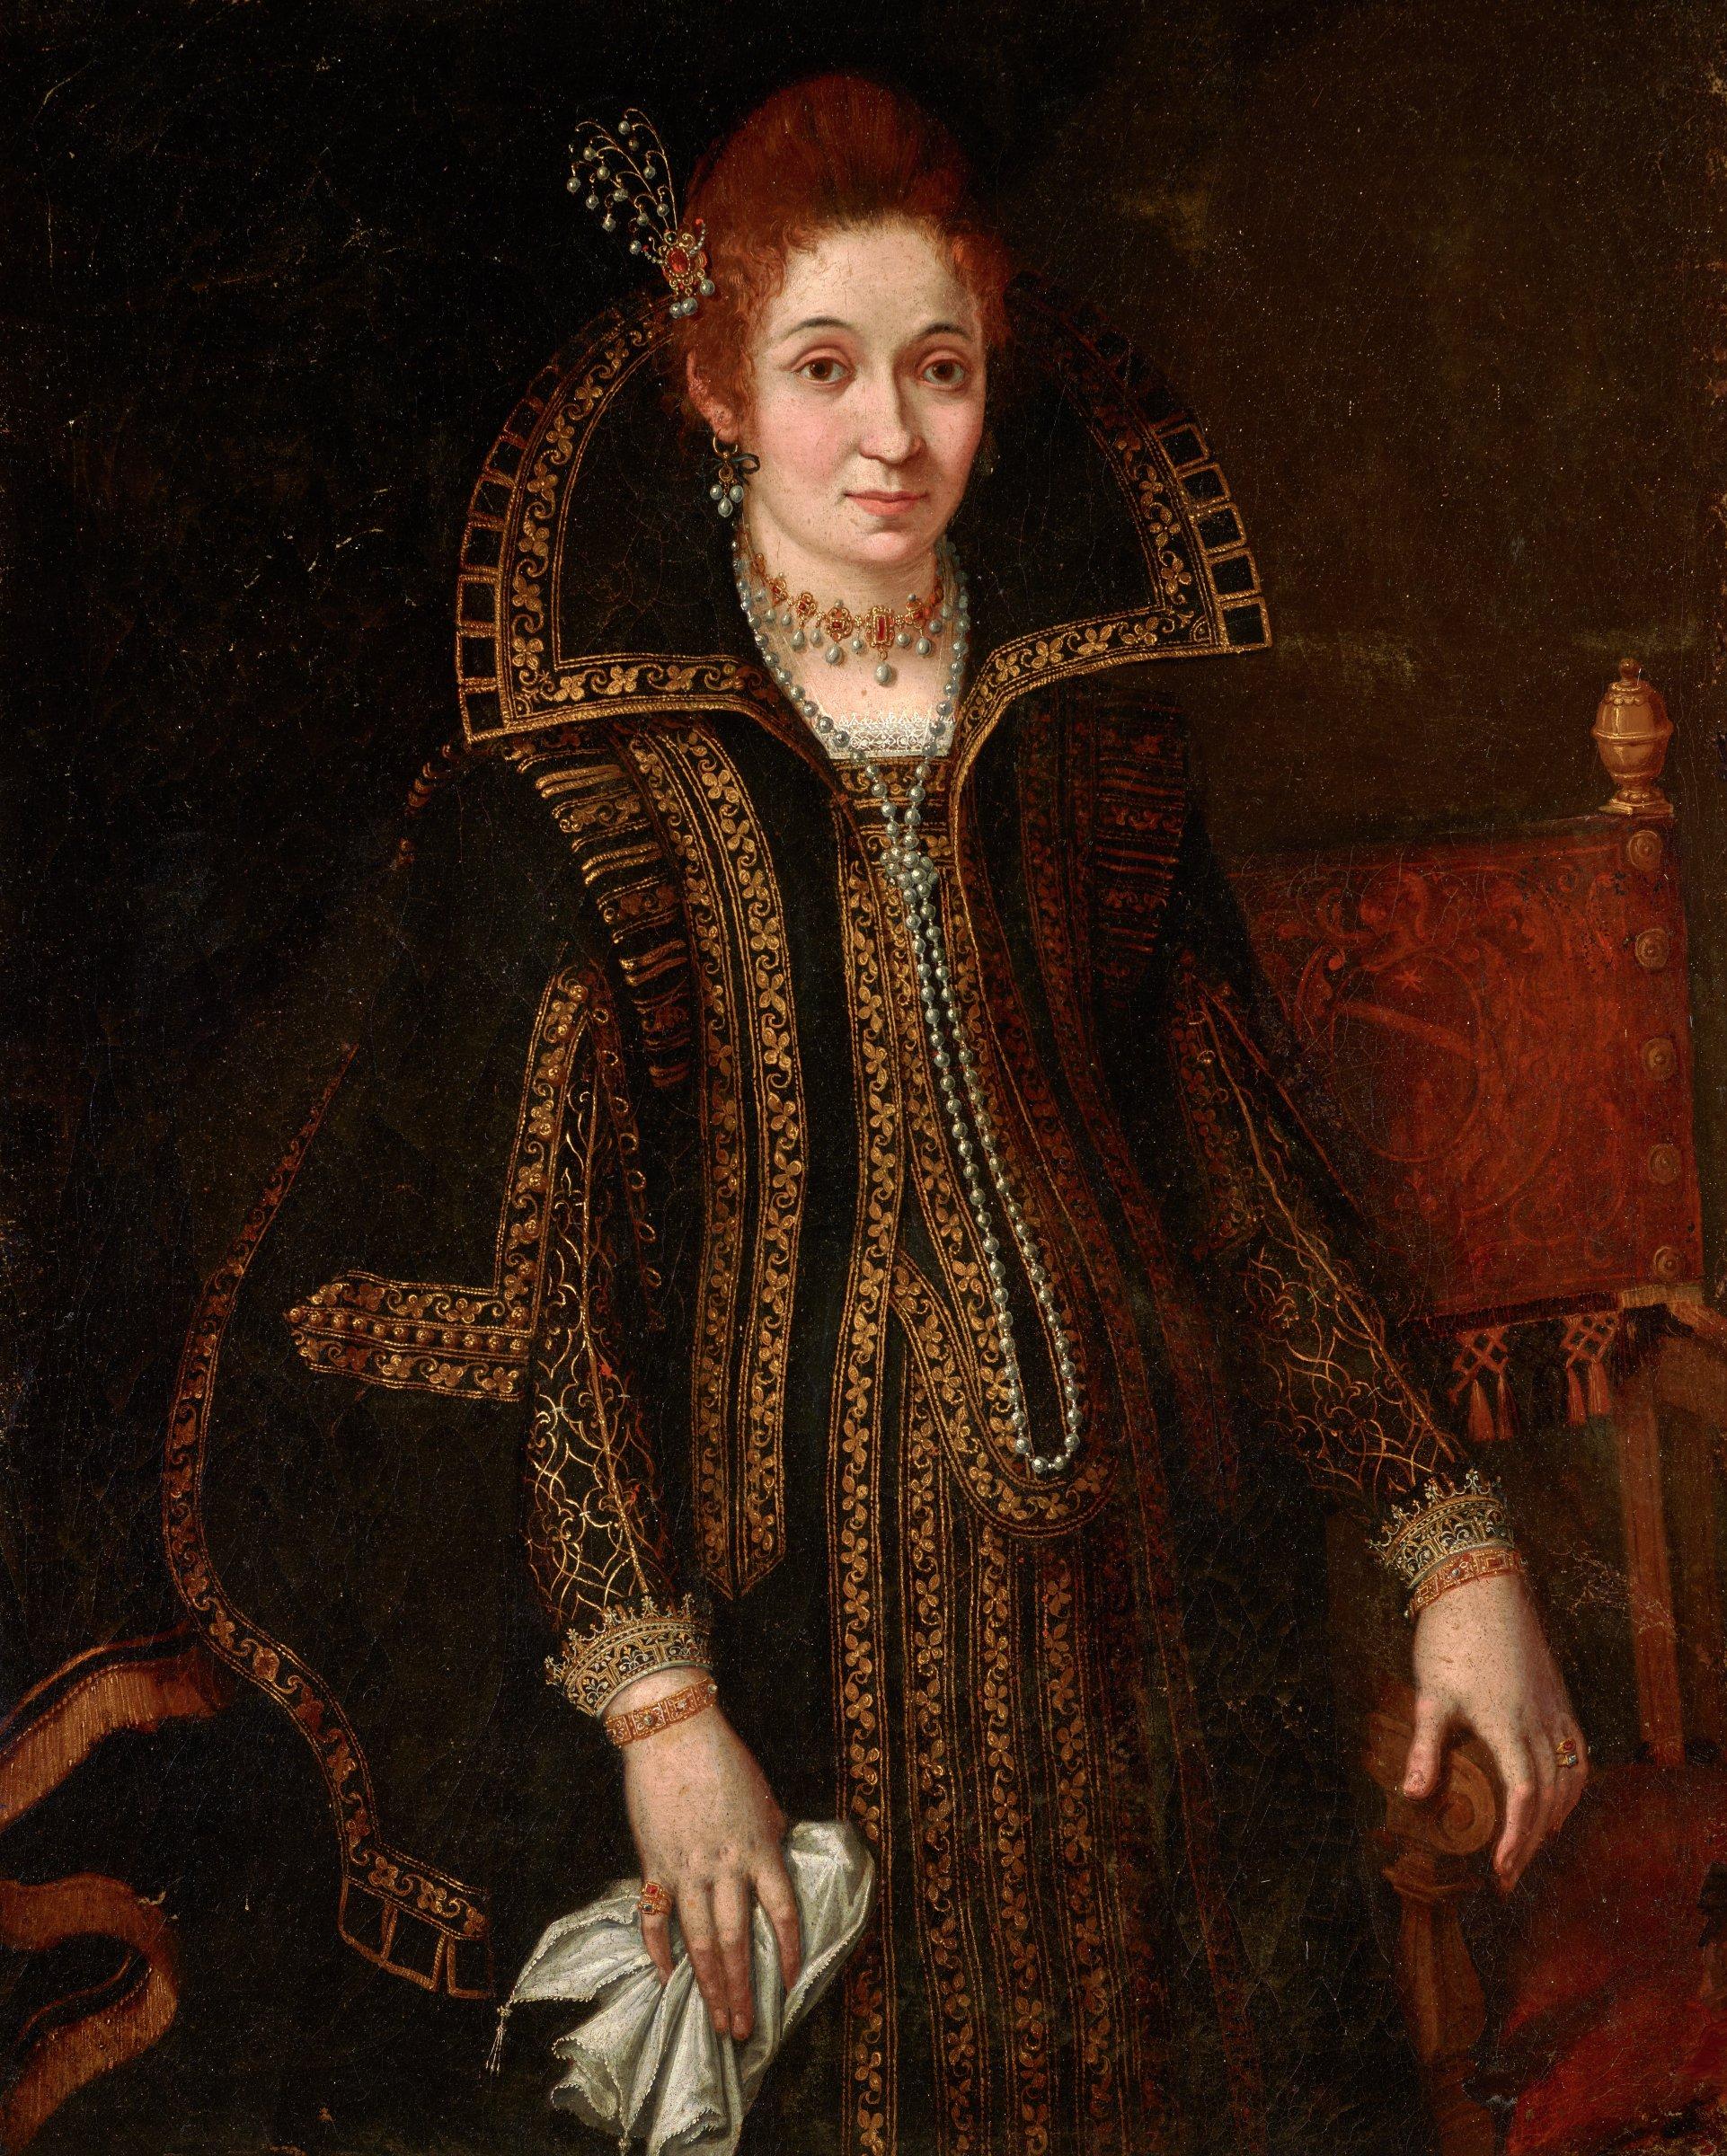 Portrait of a Lady, Lavinia Fontana, oil on canvas